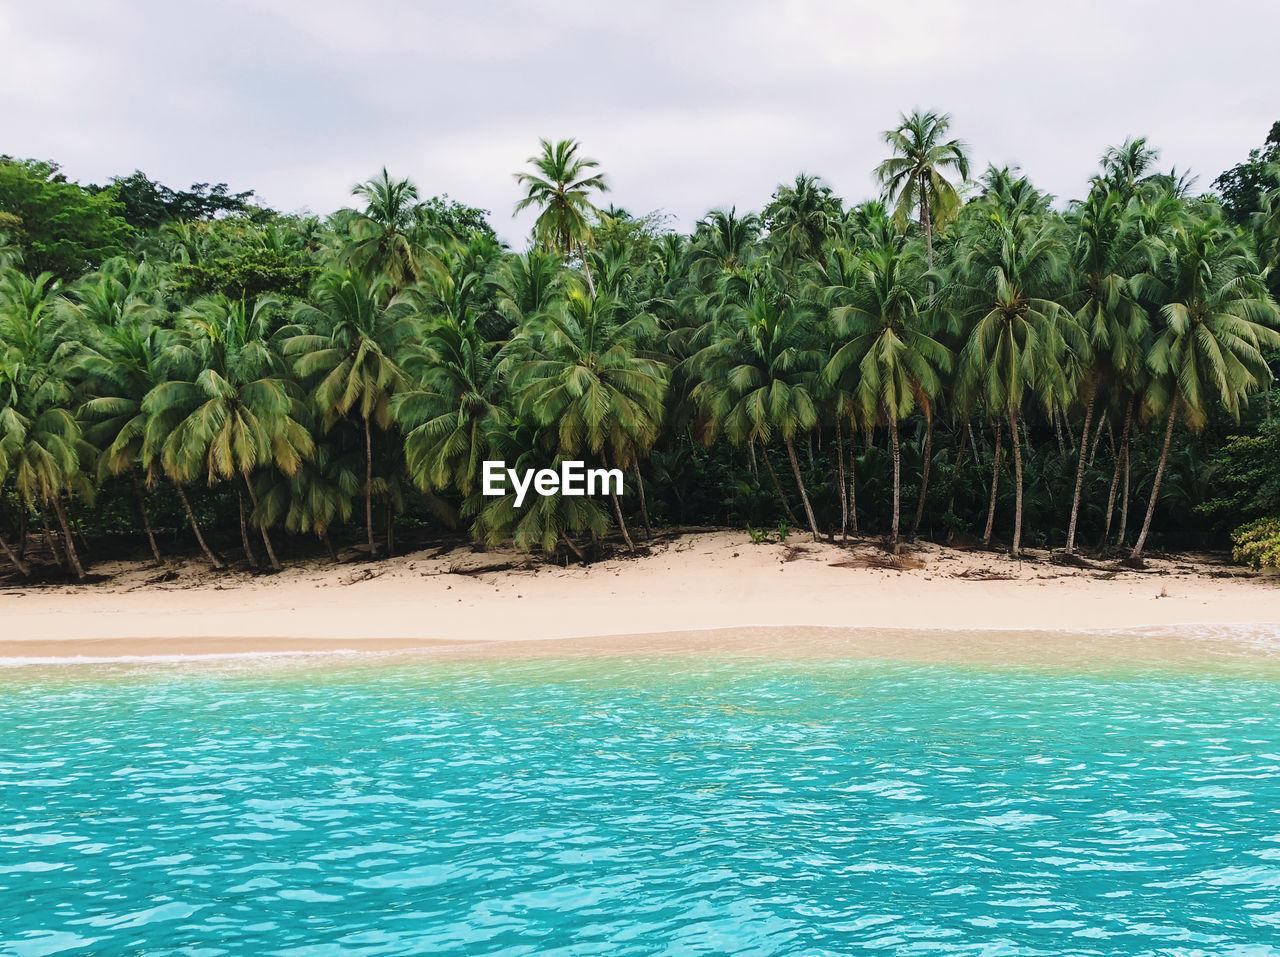 Boi beach, principe